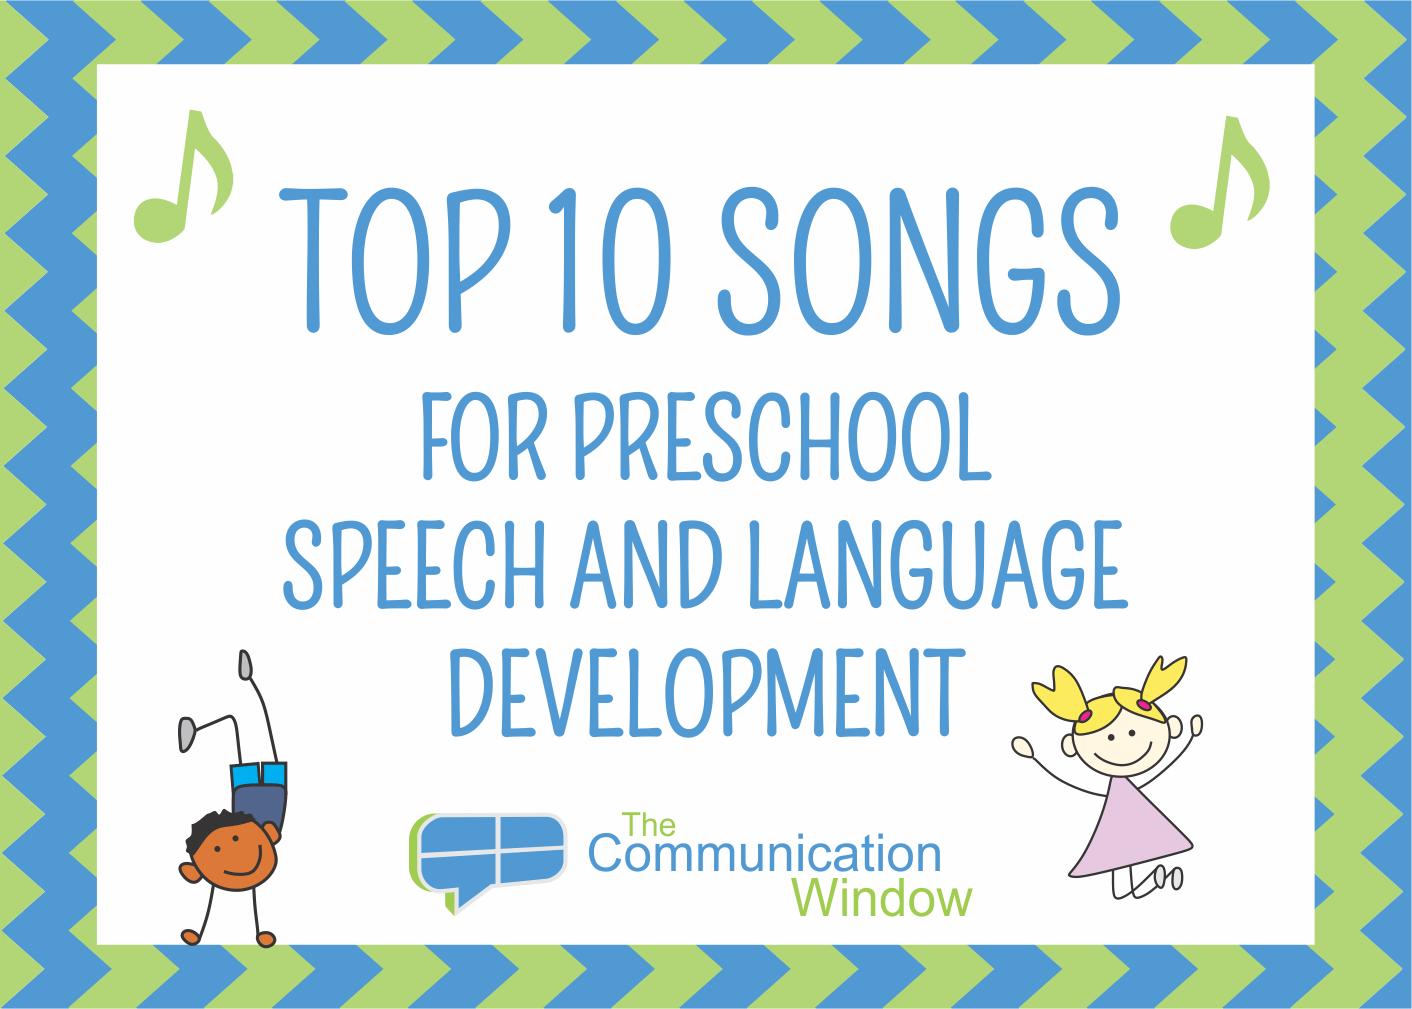 Top 10 Songs For Preschool Speech And Language Development